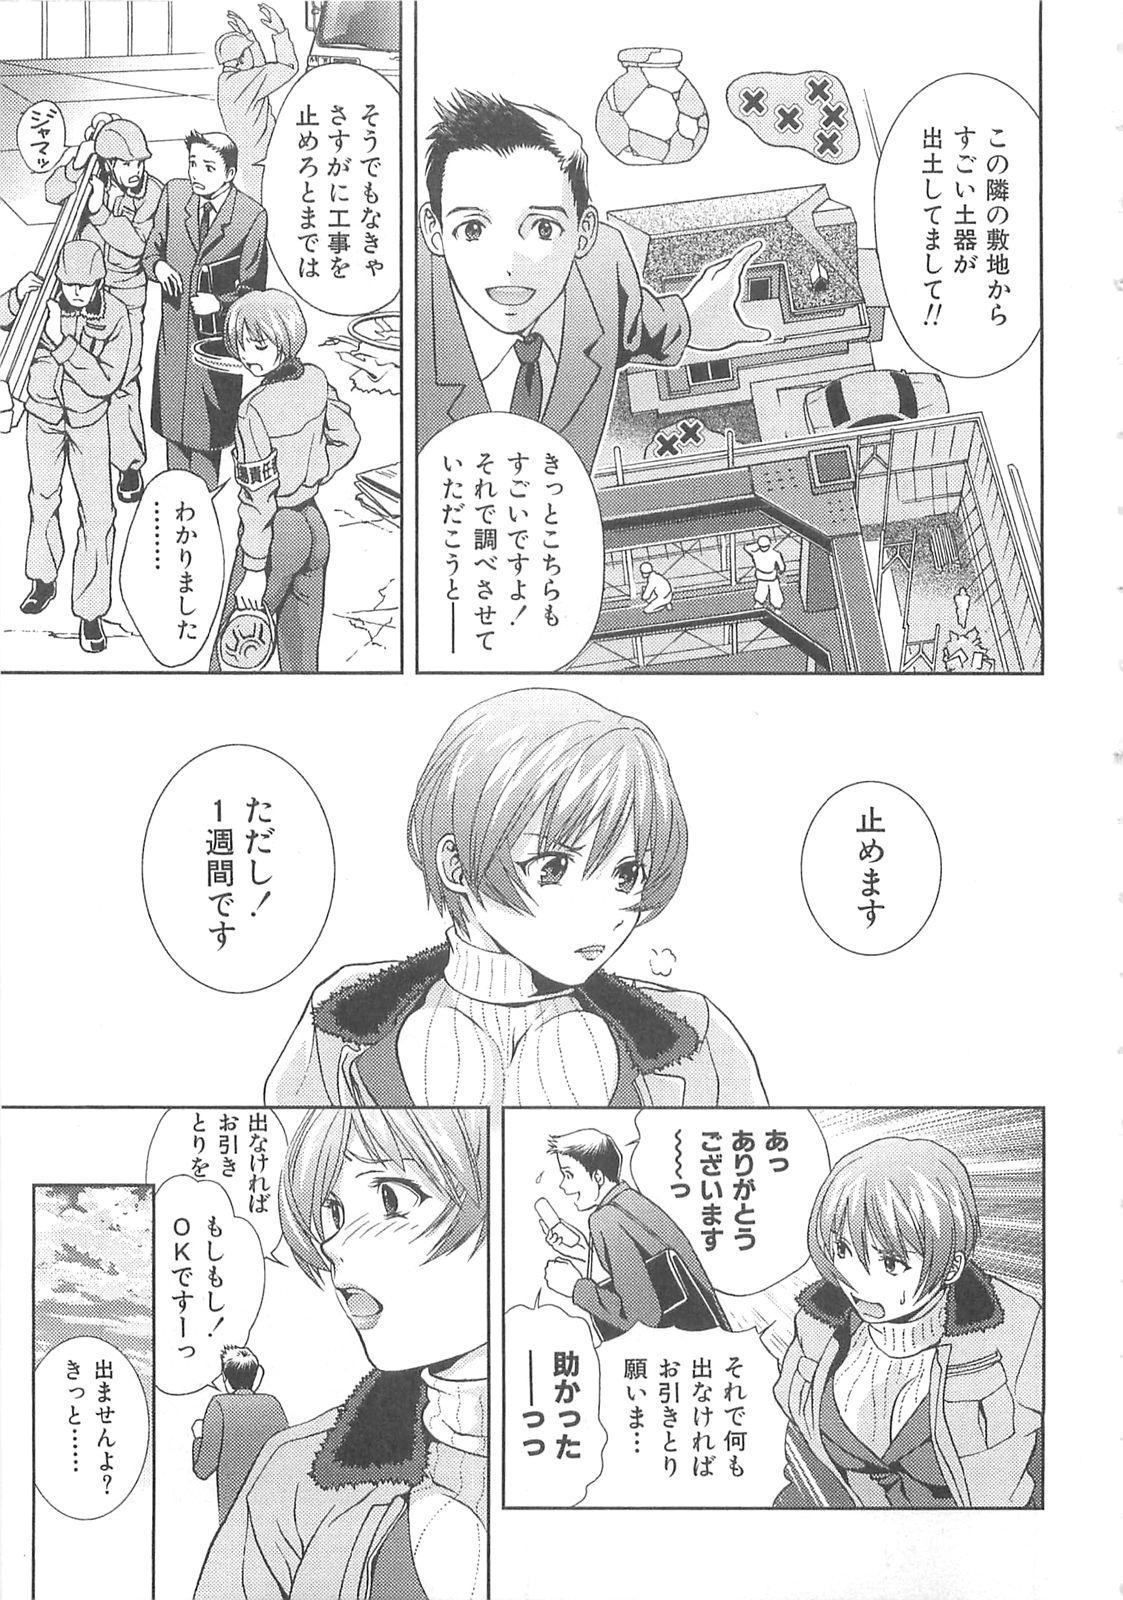 Tenshi no Kyuu - Angel's Pretty Hip 145